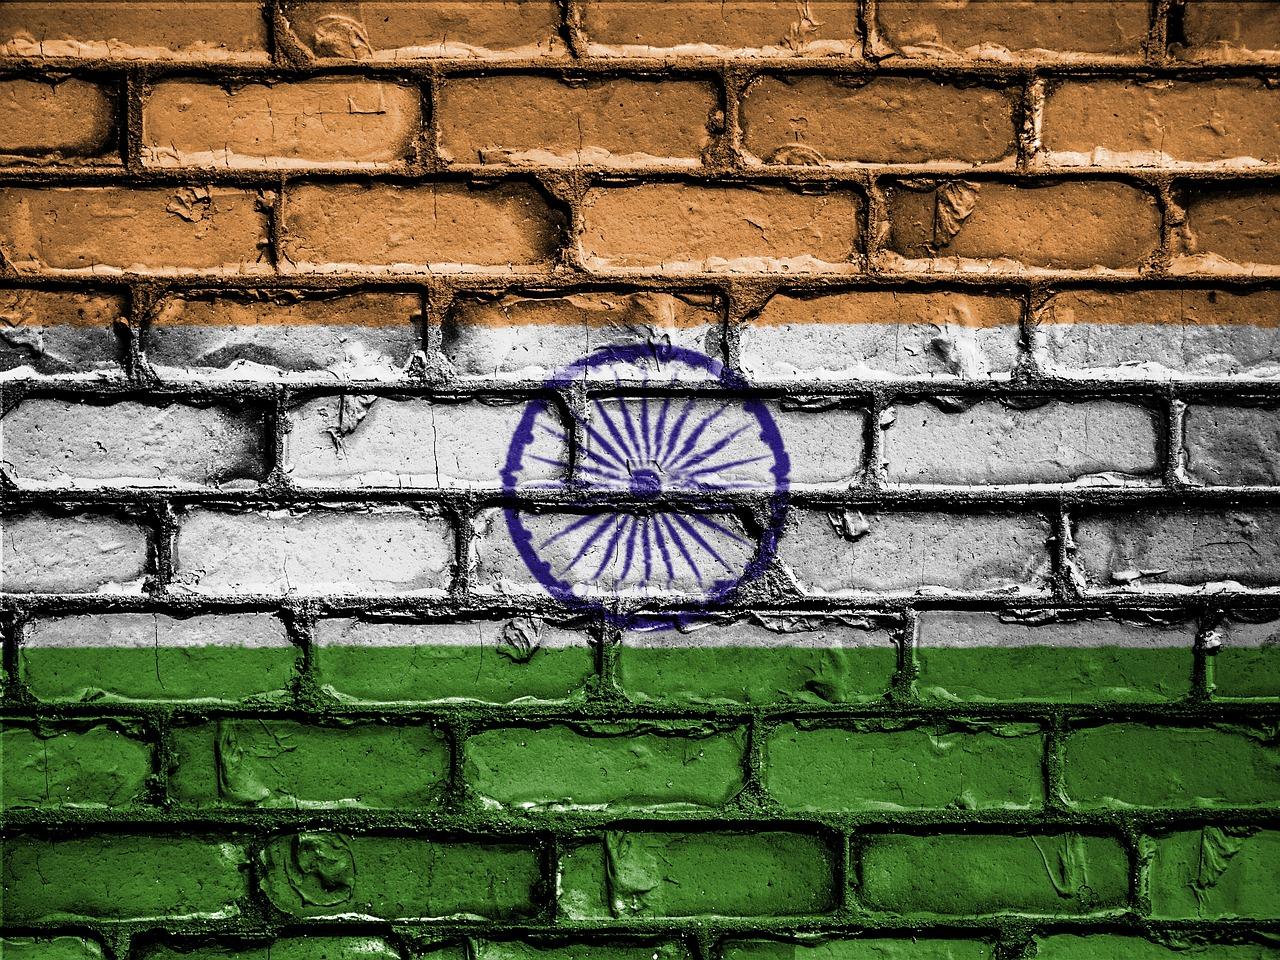 bharat 22 etf twenty two companies one investment sanjay matai